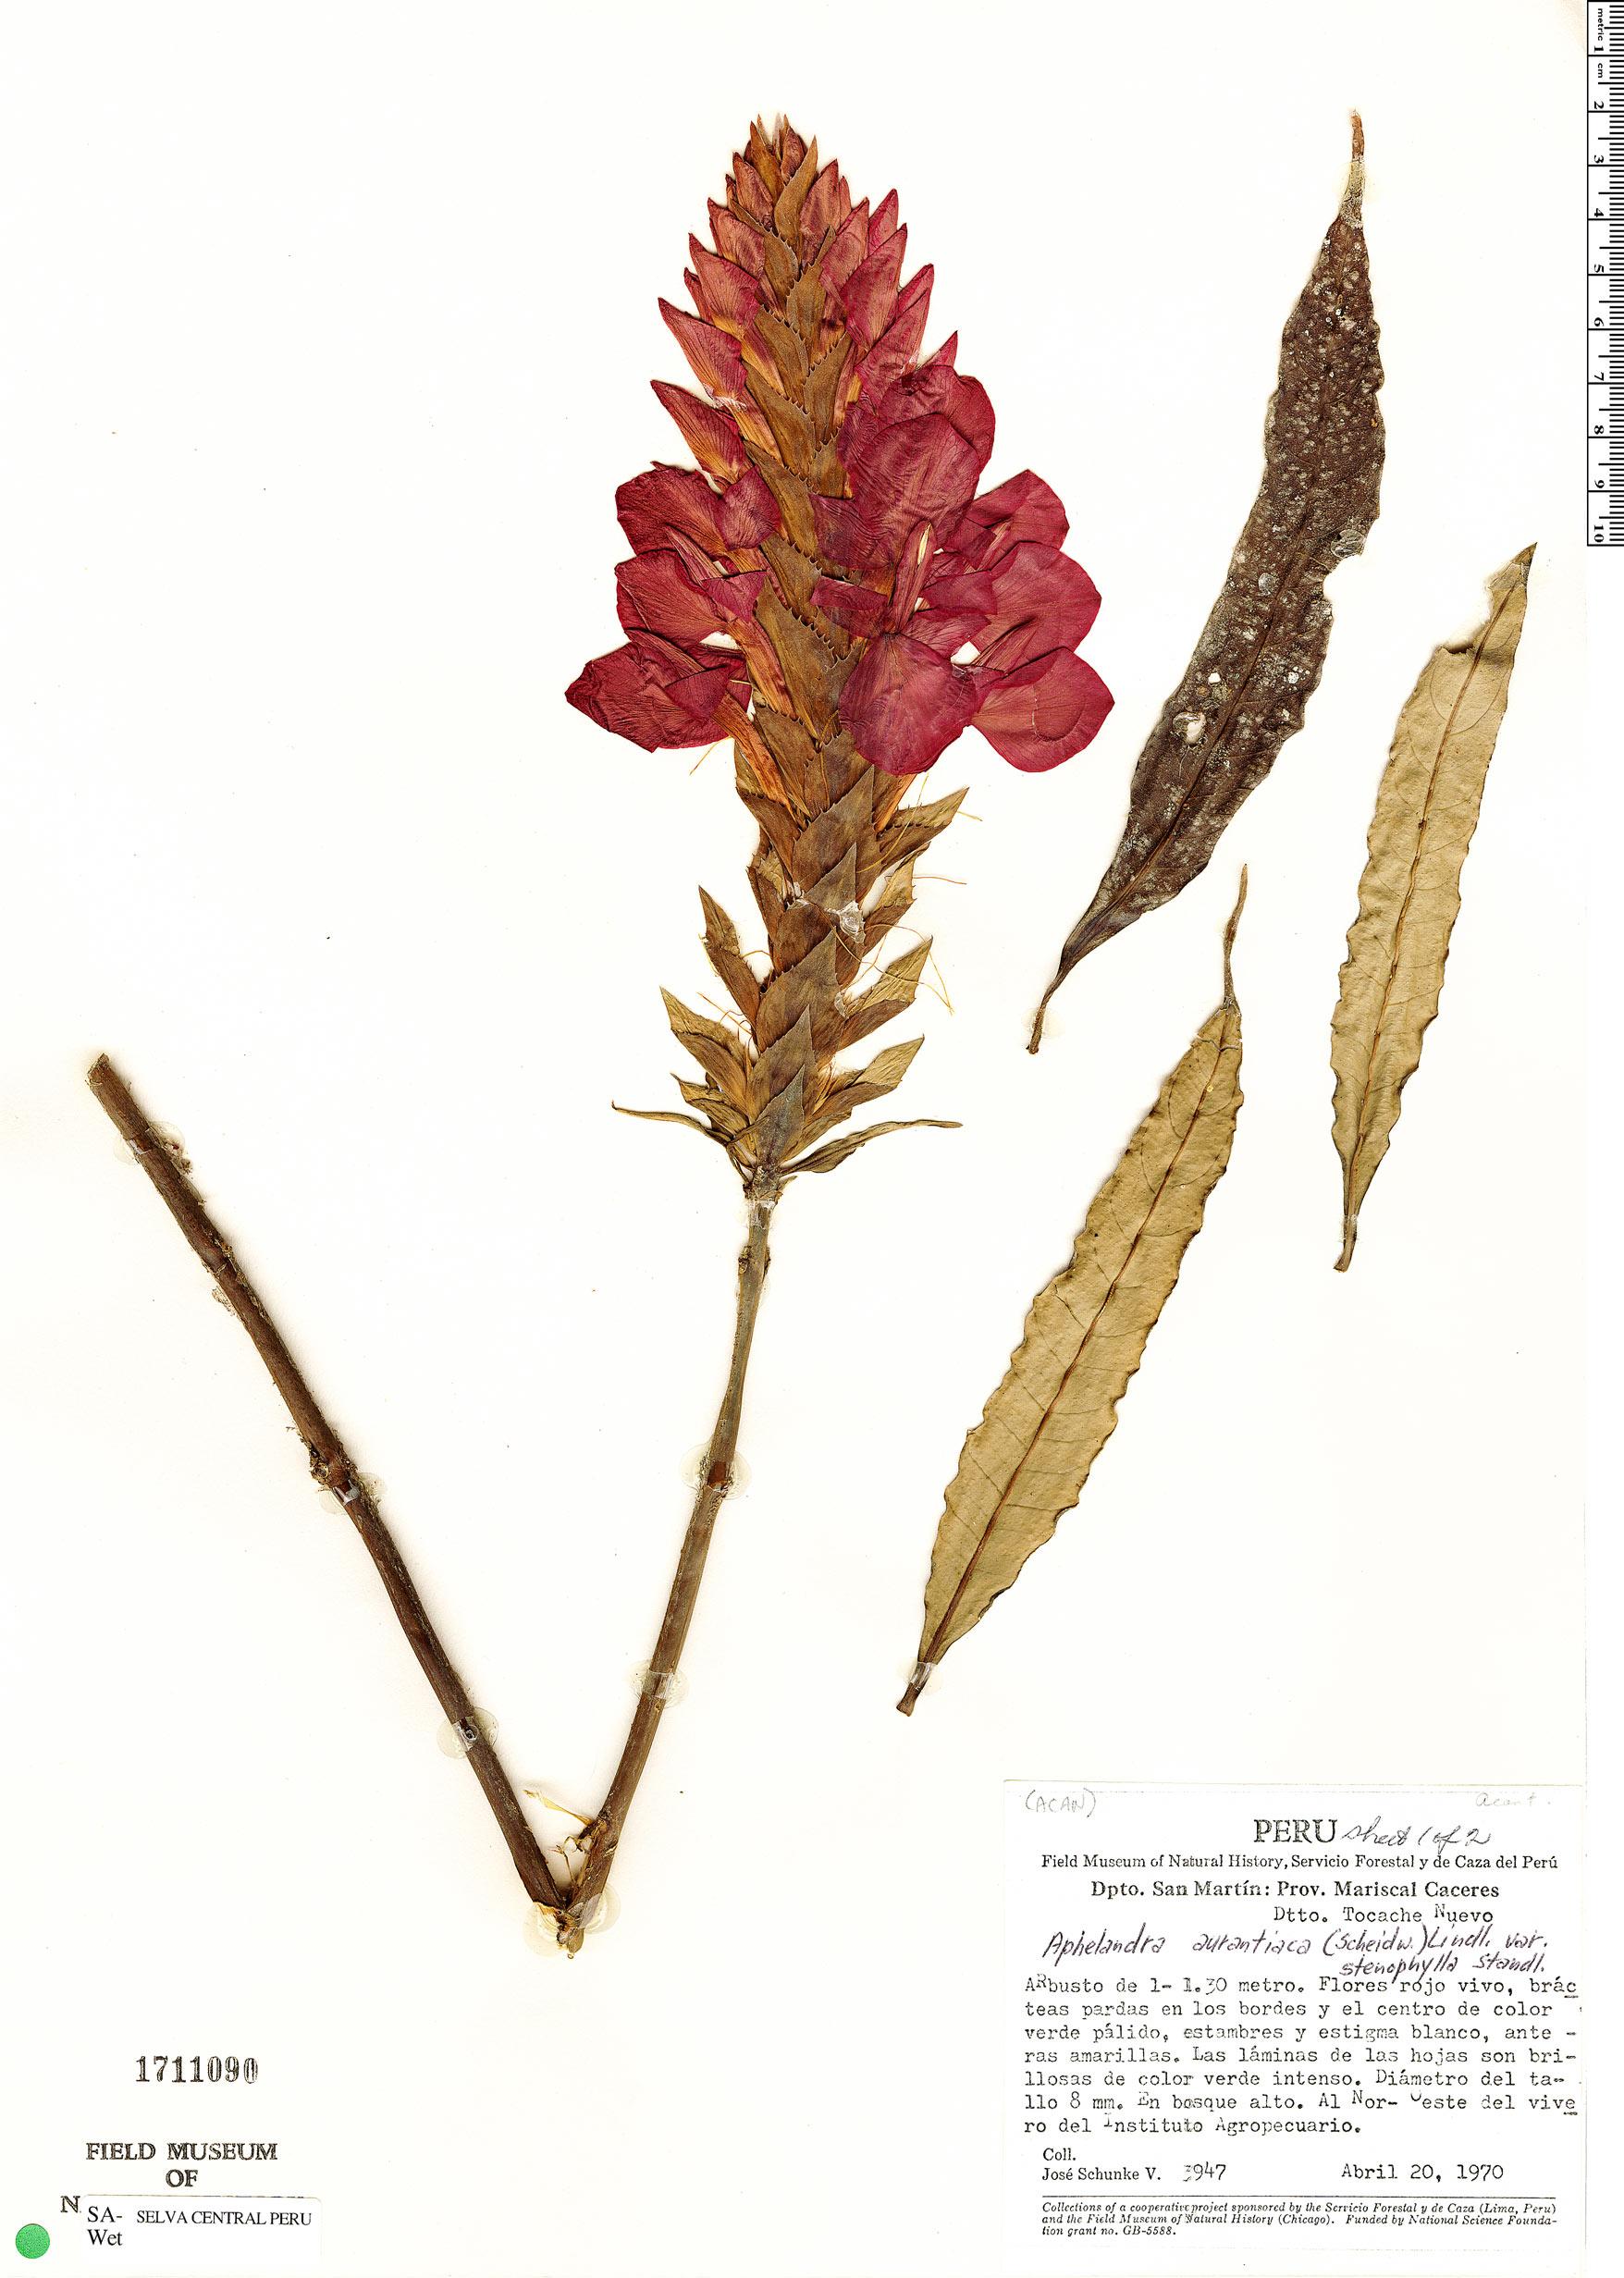 Specimen: Aphelandra aurantiaca